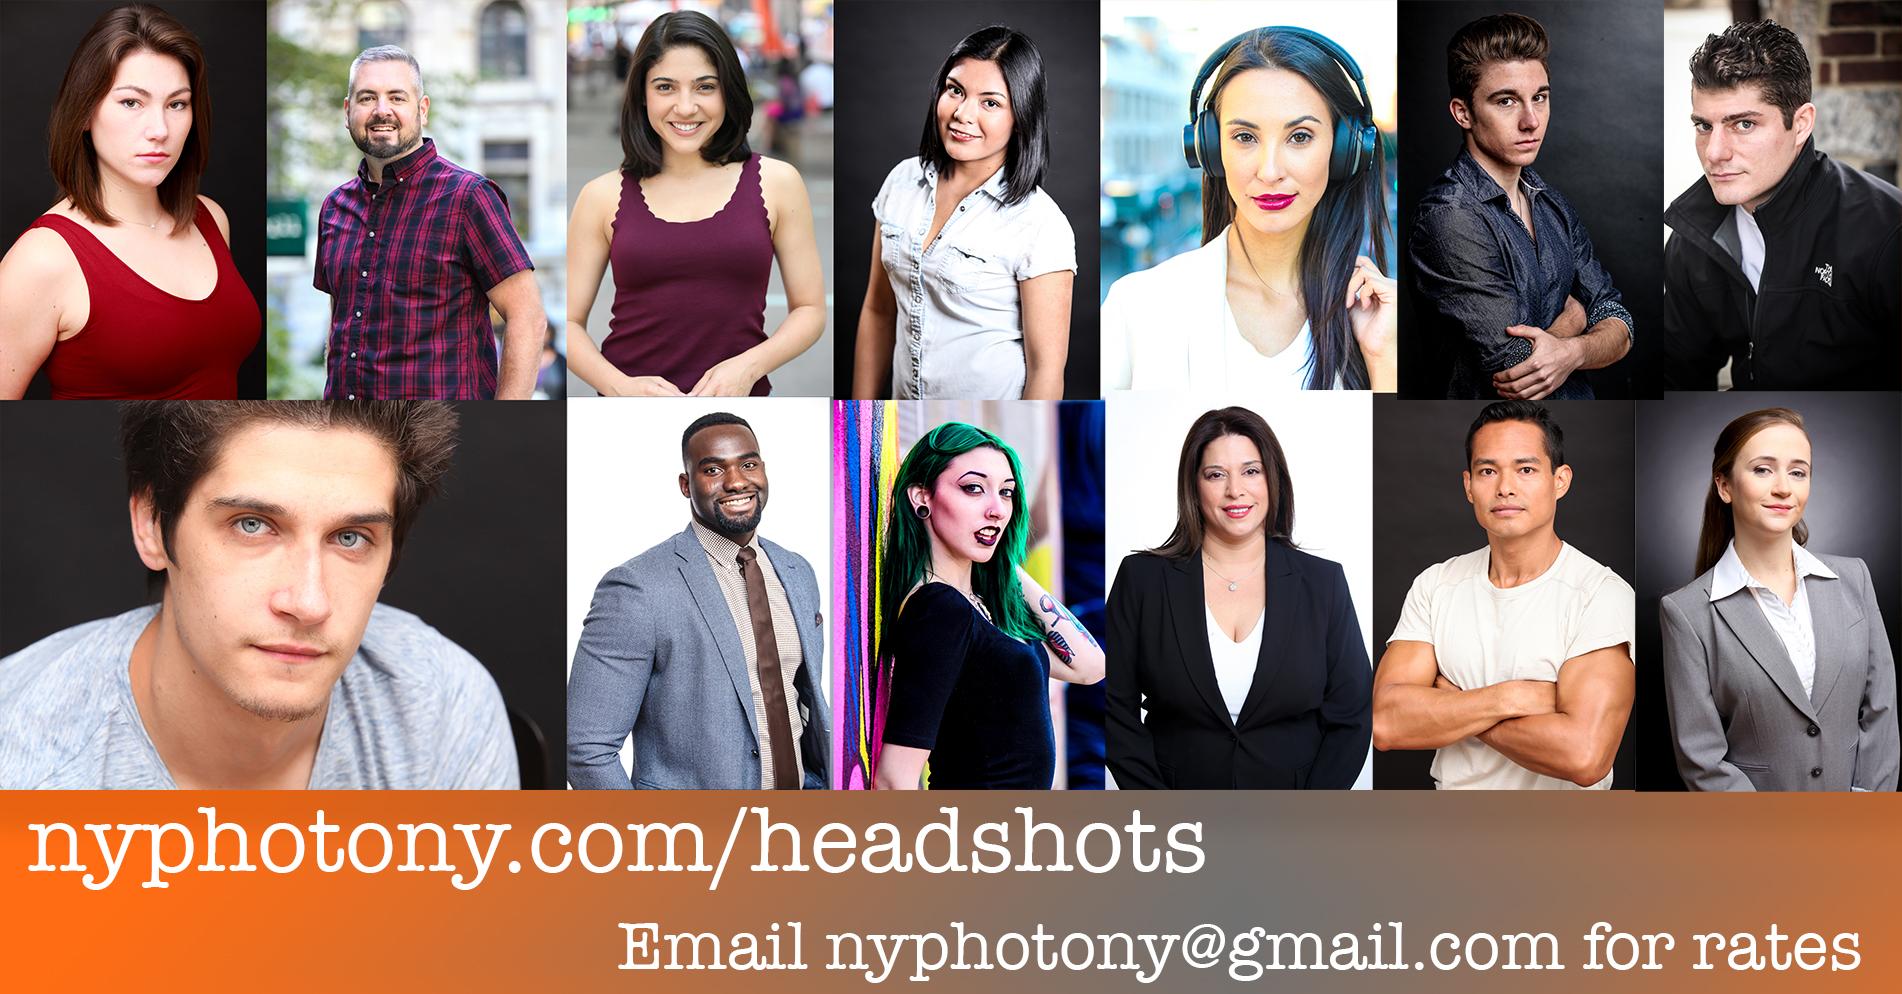 headshots nyc, new york headshots, pro portraits, corporate headshots, acting headshots, modeling headshots, awesome headshots,